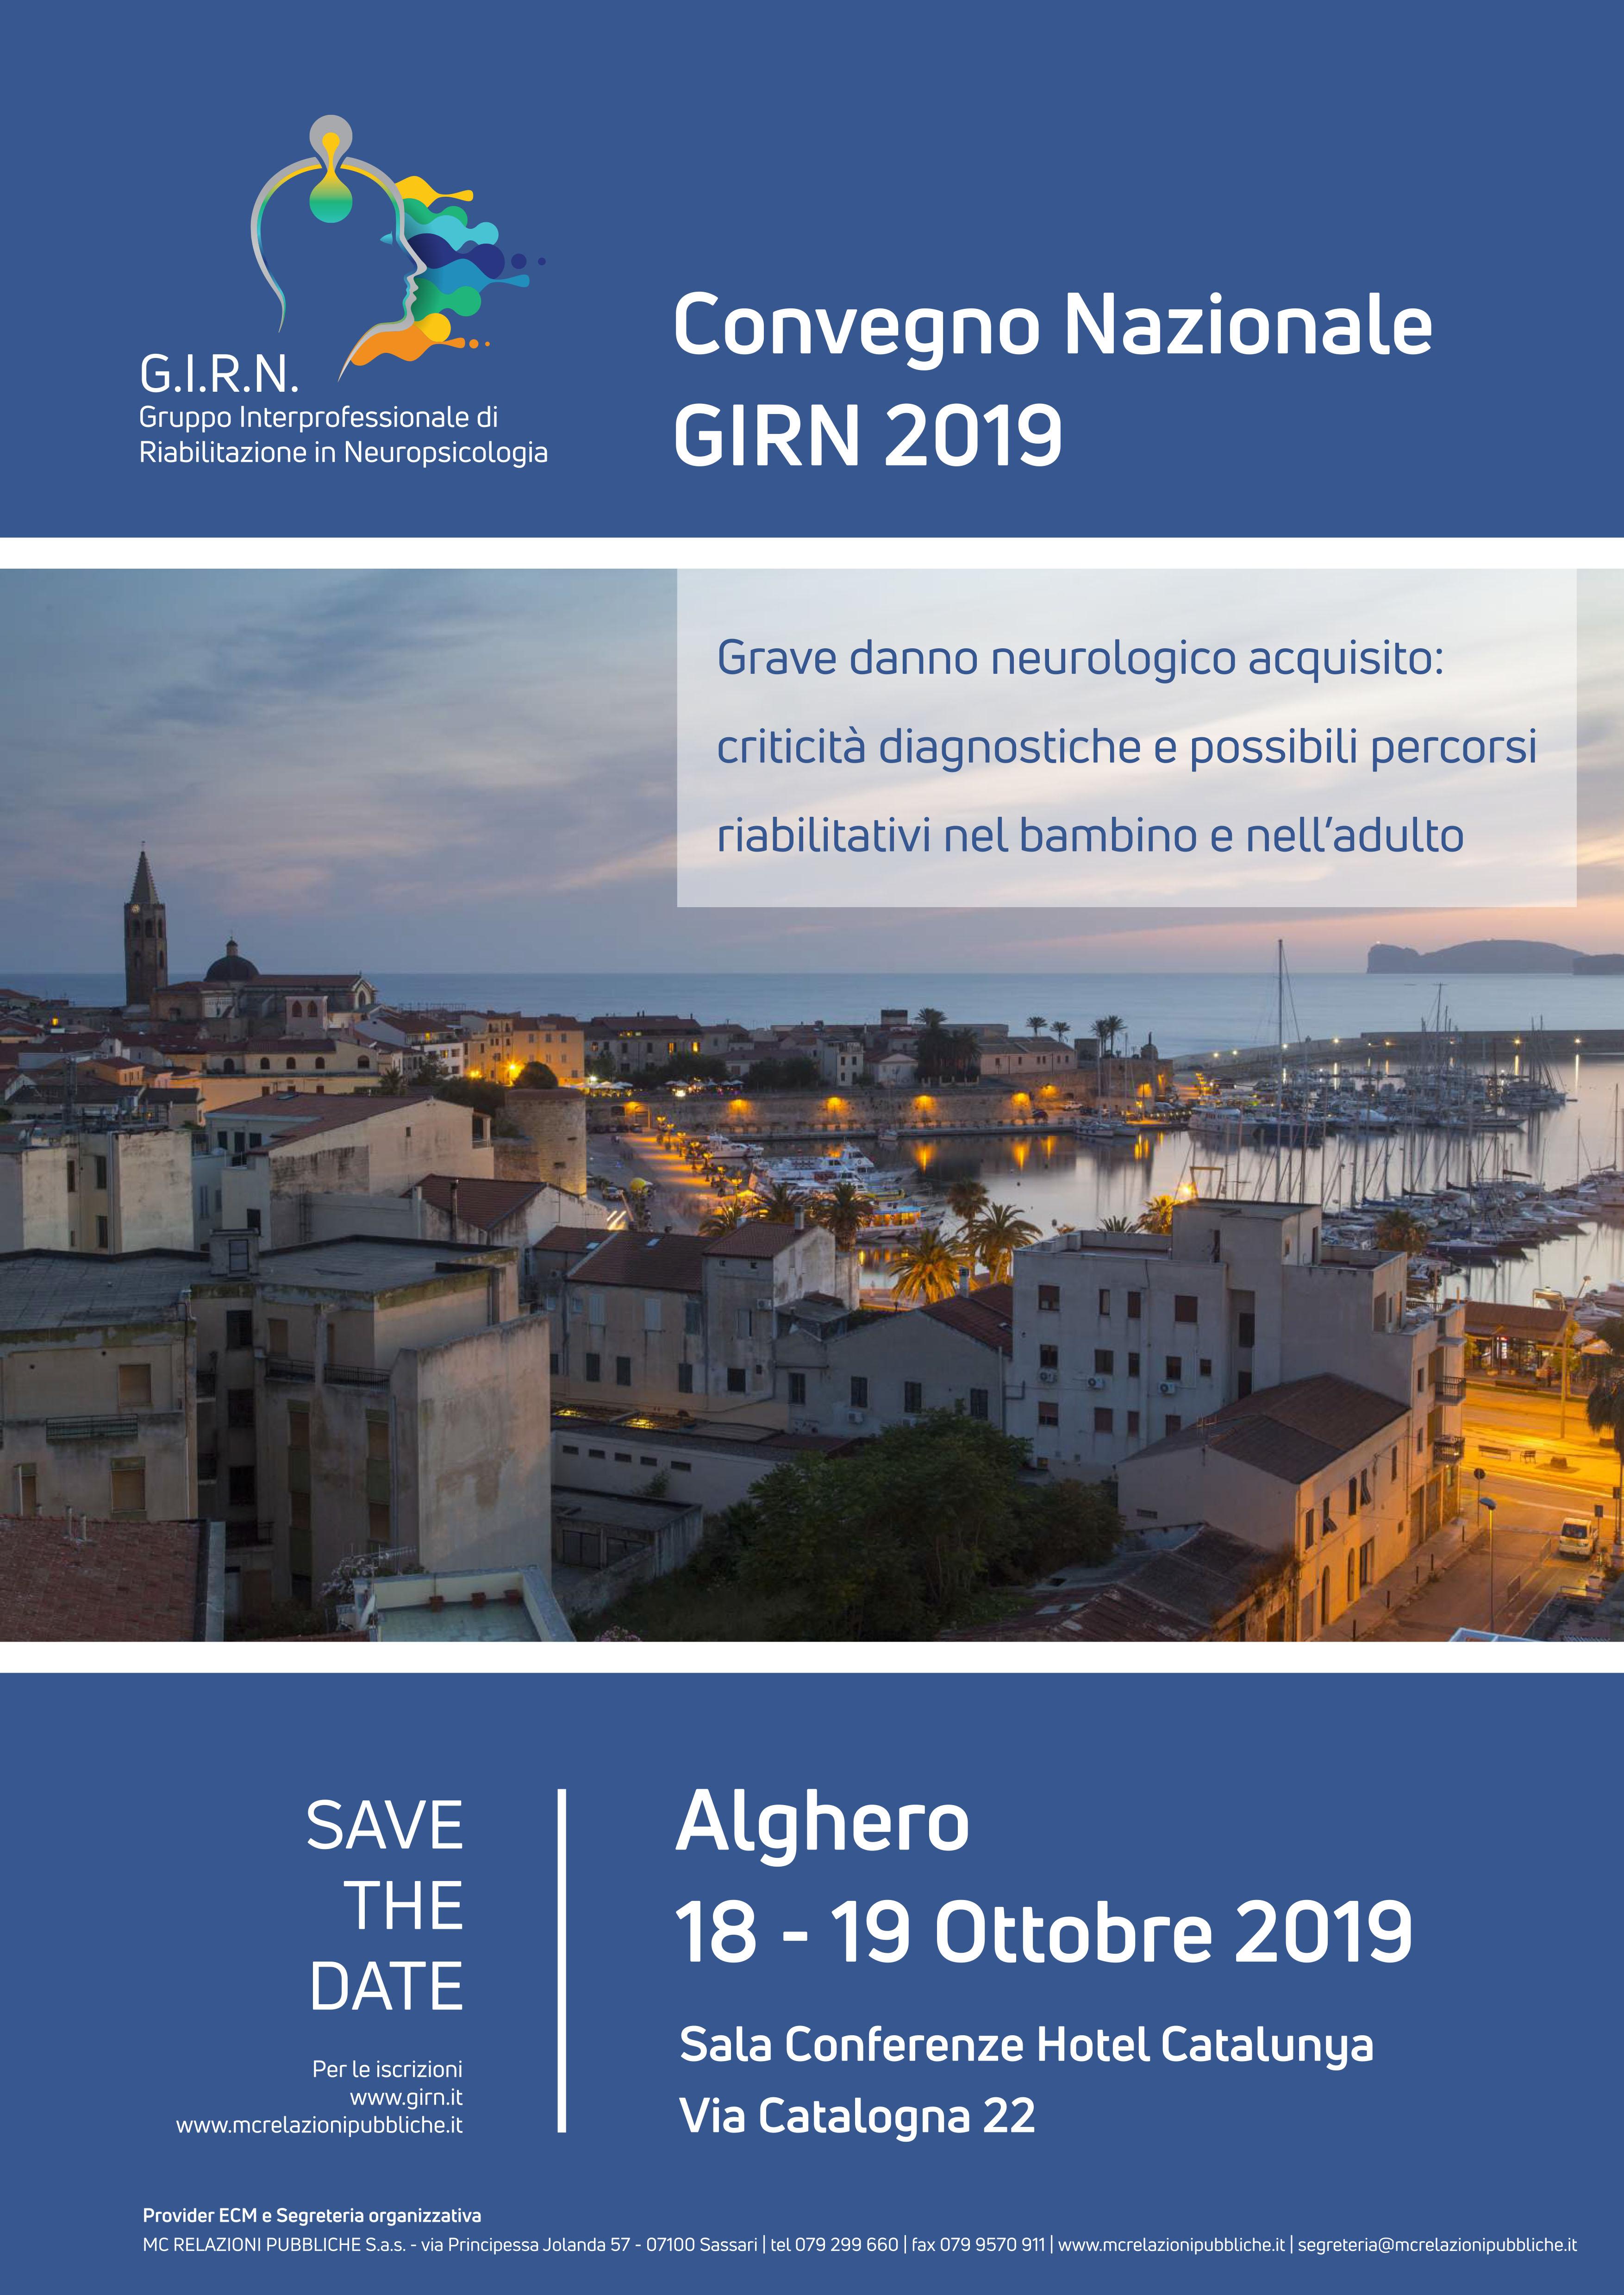 Convegno Nazionale GIRN 2019